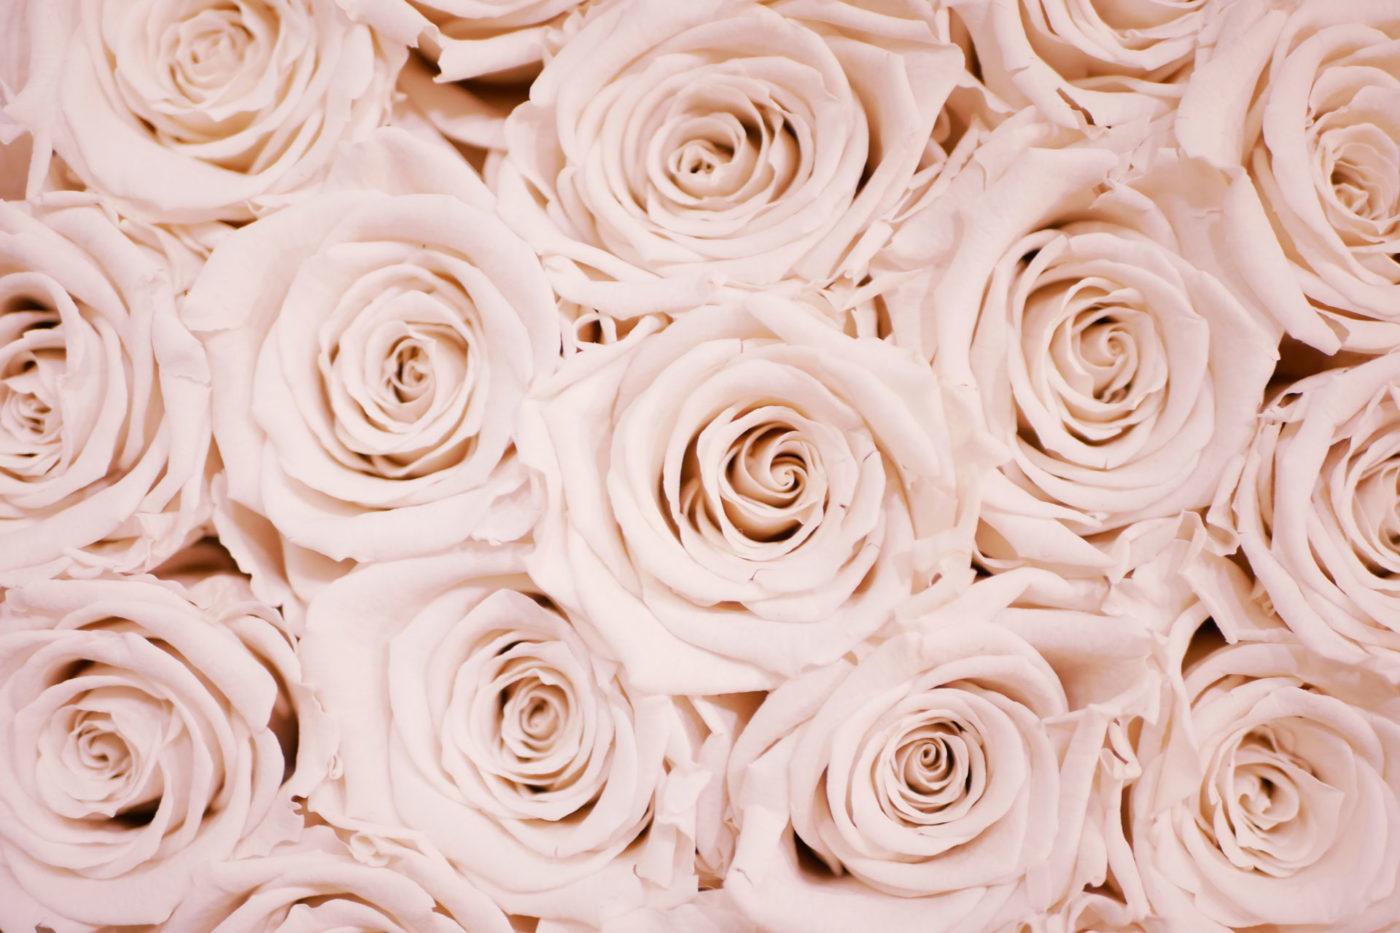 roses Photo by Lauza Loistl on Unsplash